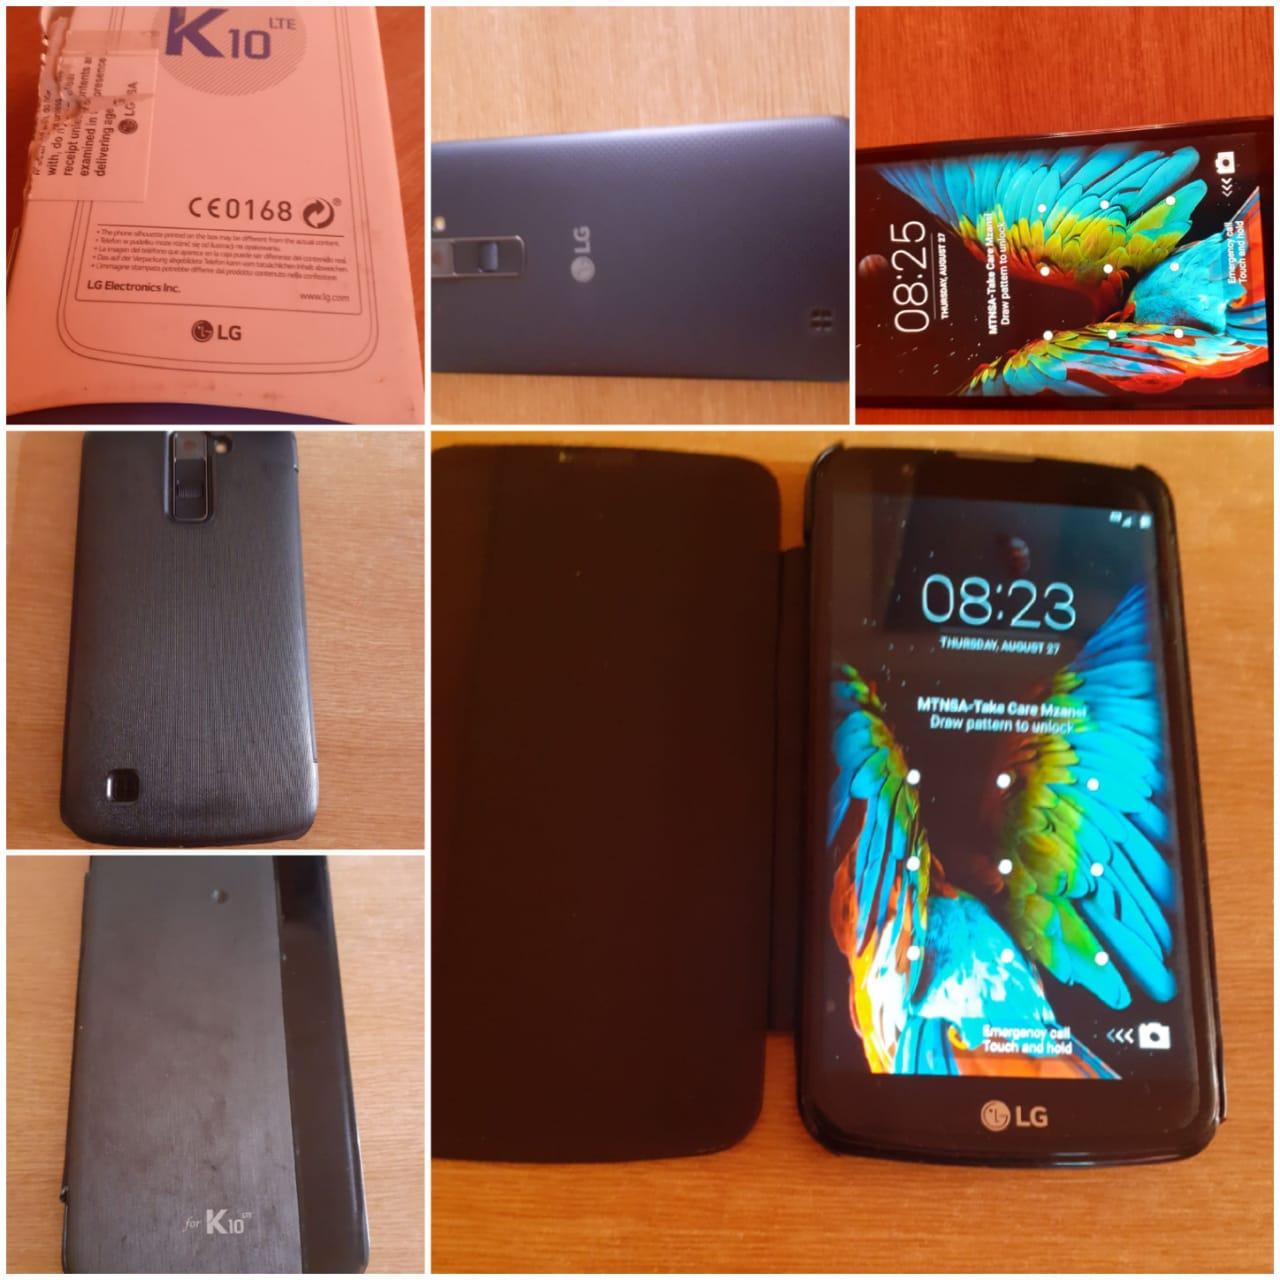 LG K10 CELLPHONE FOR SALE.